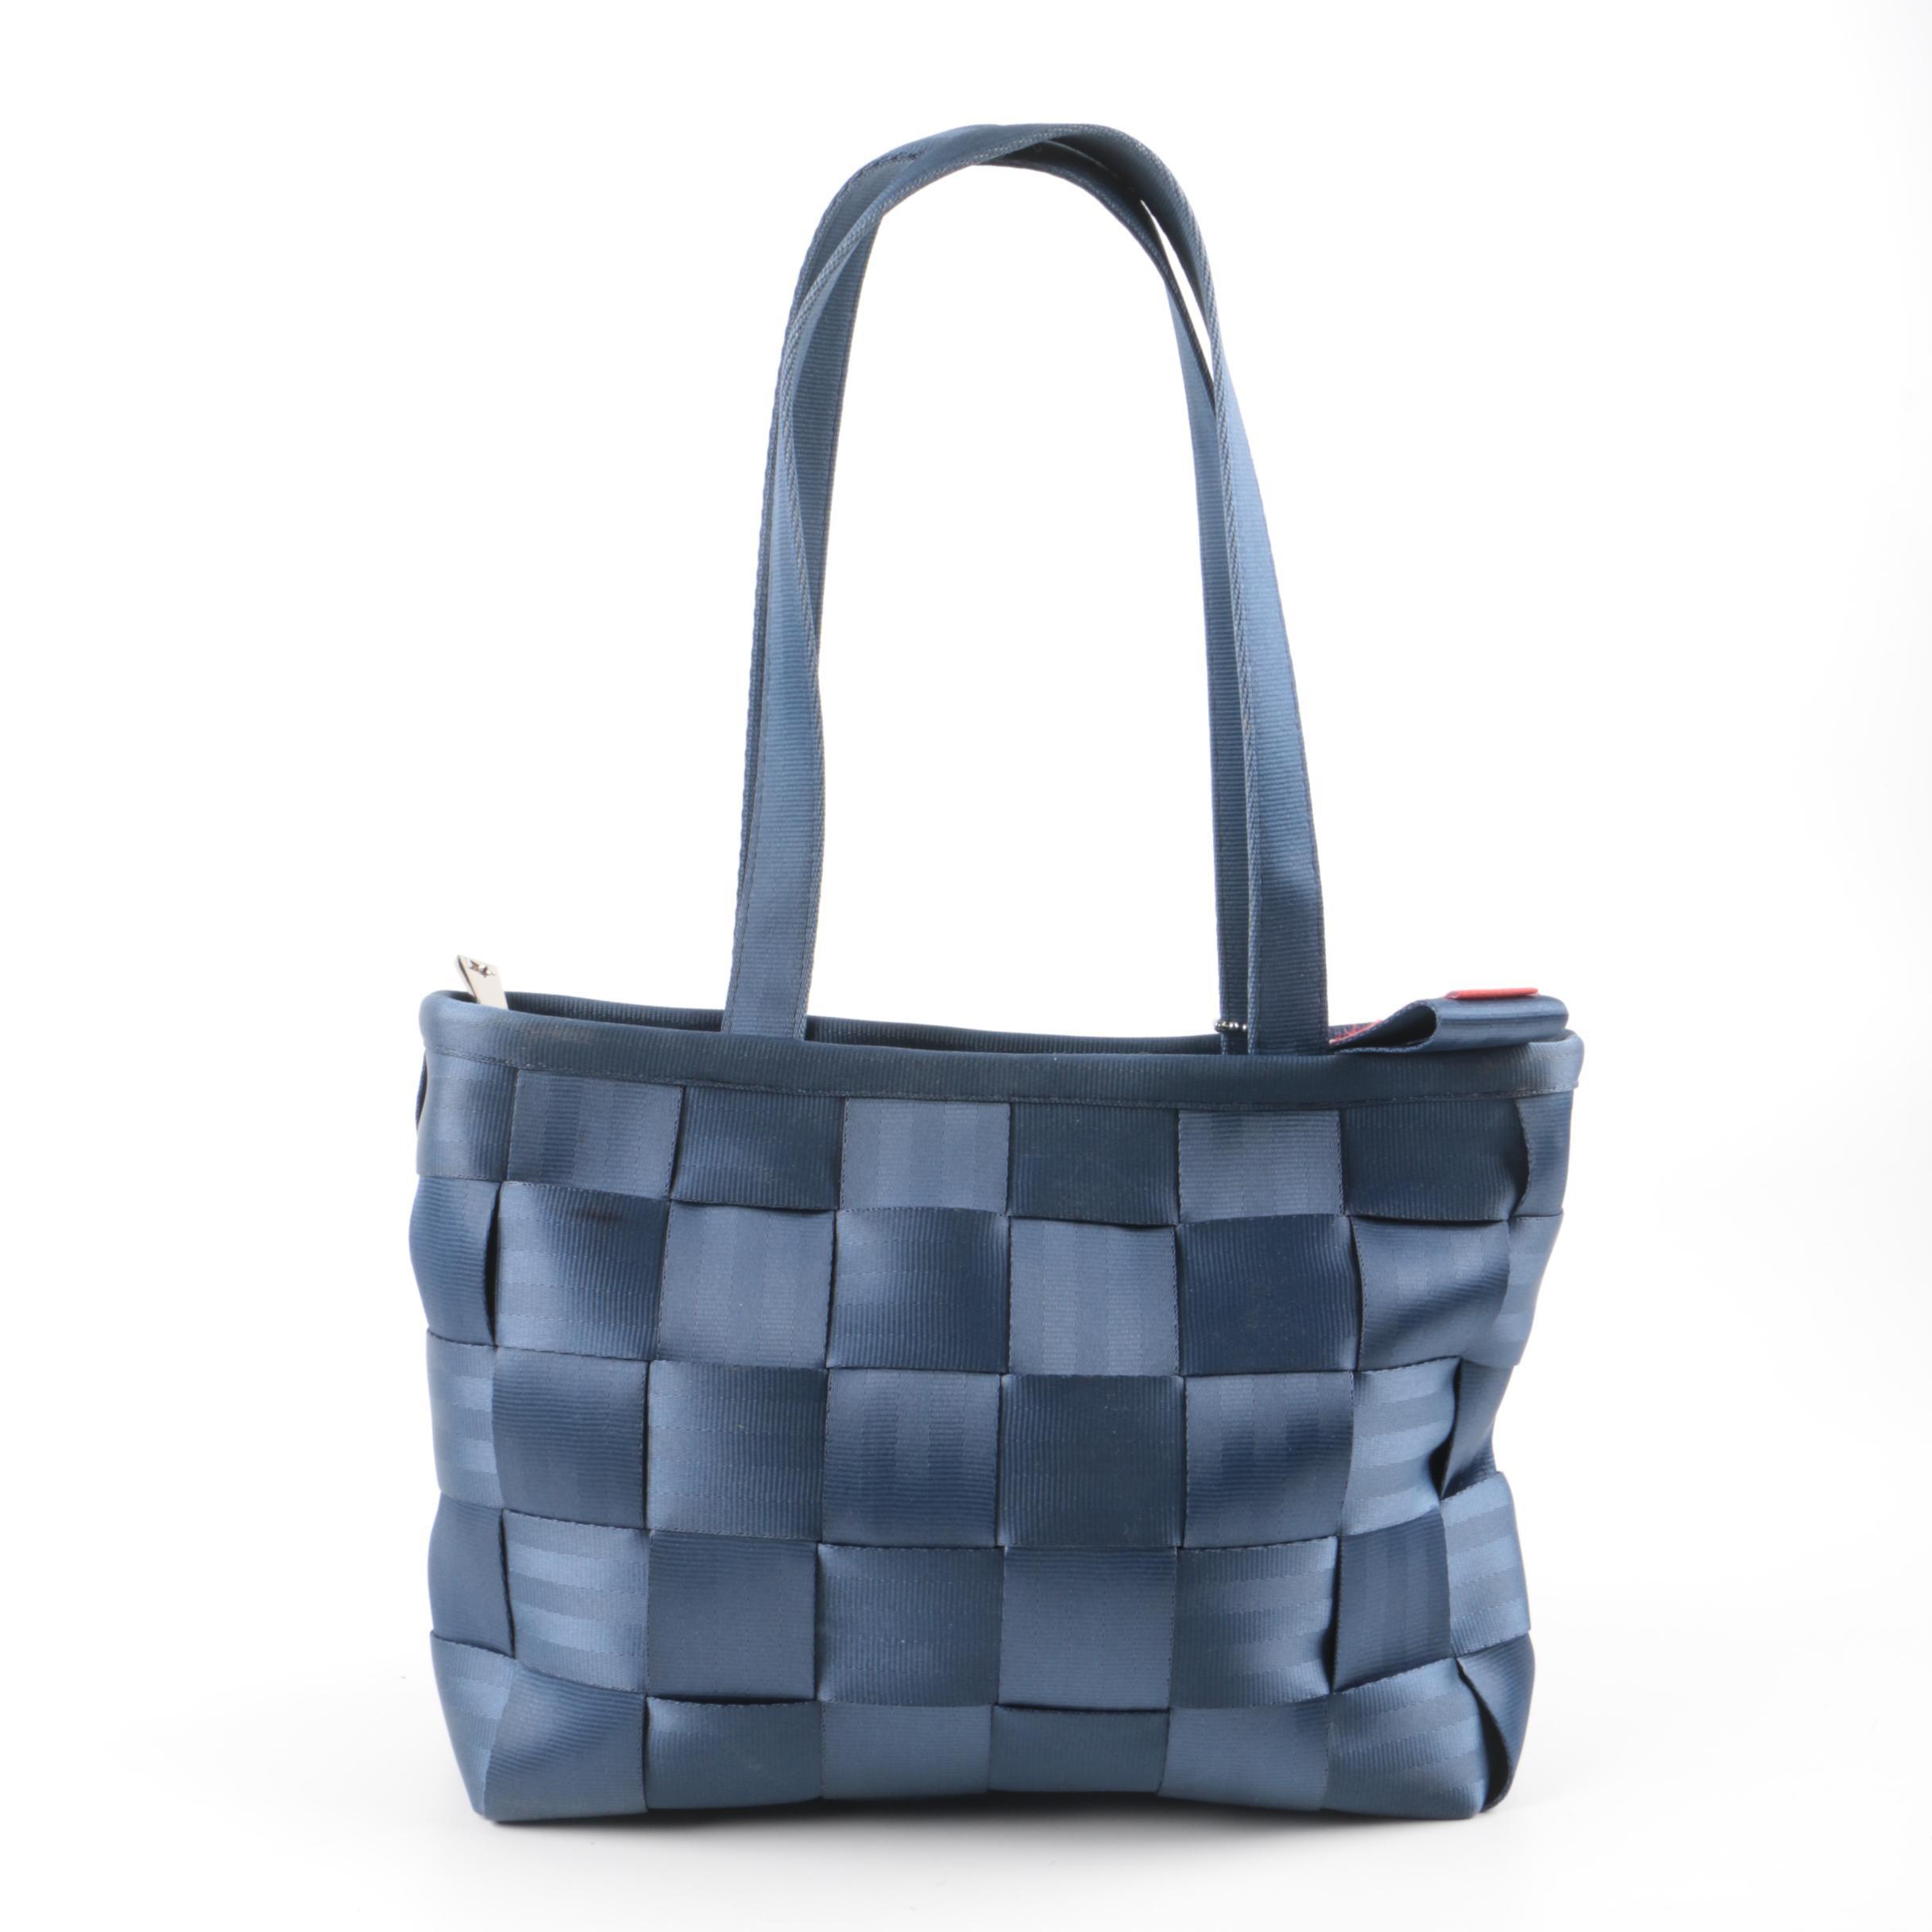 Harveys Blue Seatbelt Bag